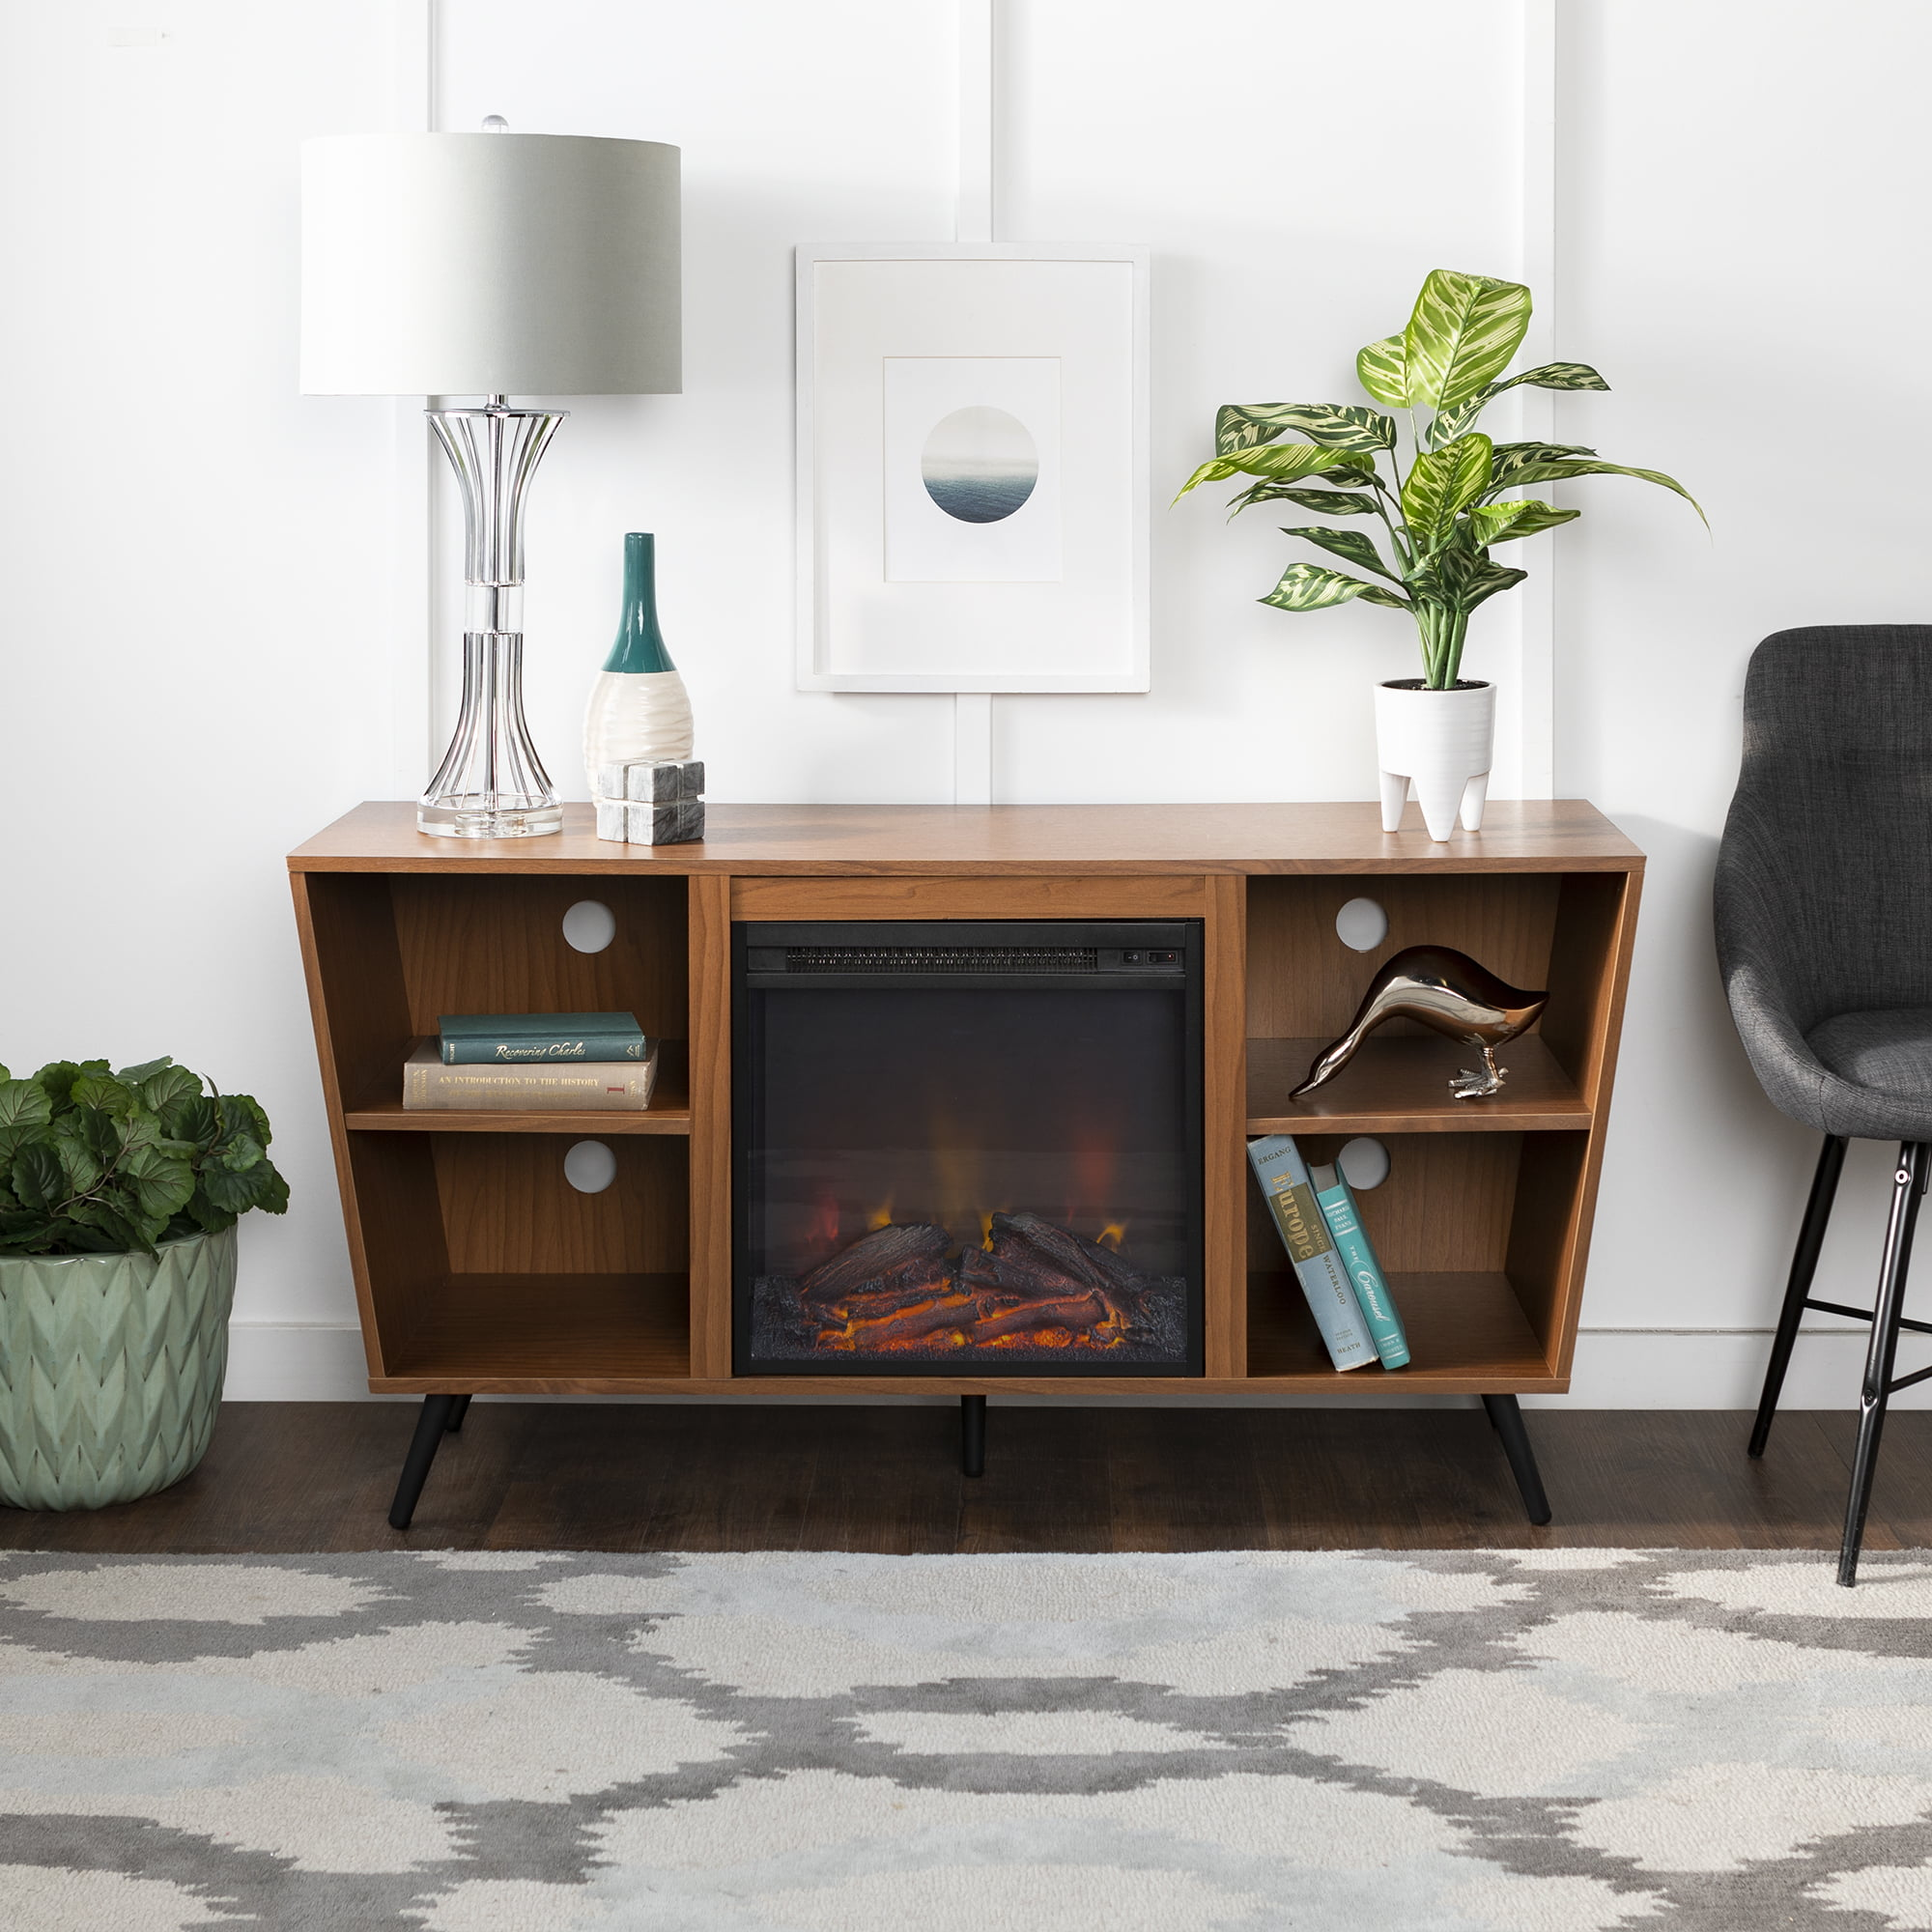 Picture of: Manor Park 52 Mid Century Modern Angled Side Fireplace Tv Stand Acorn Walmart Com Walmart Com